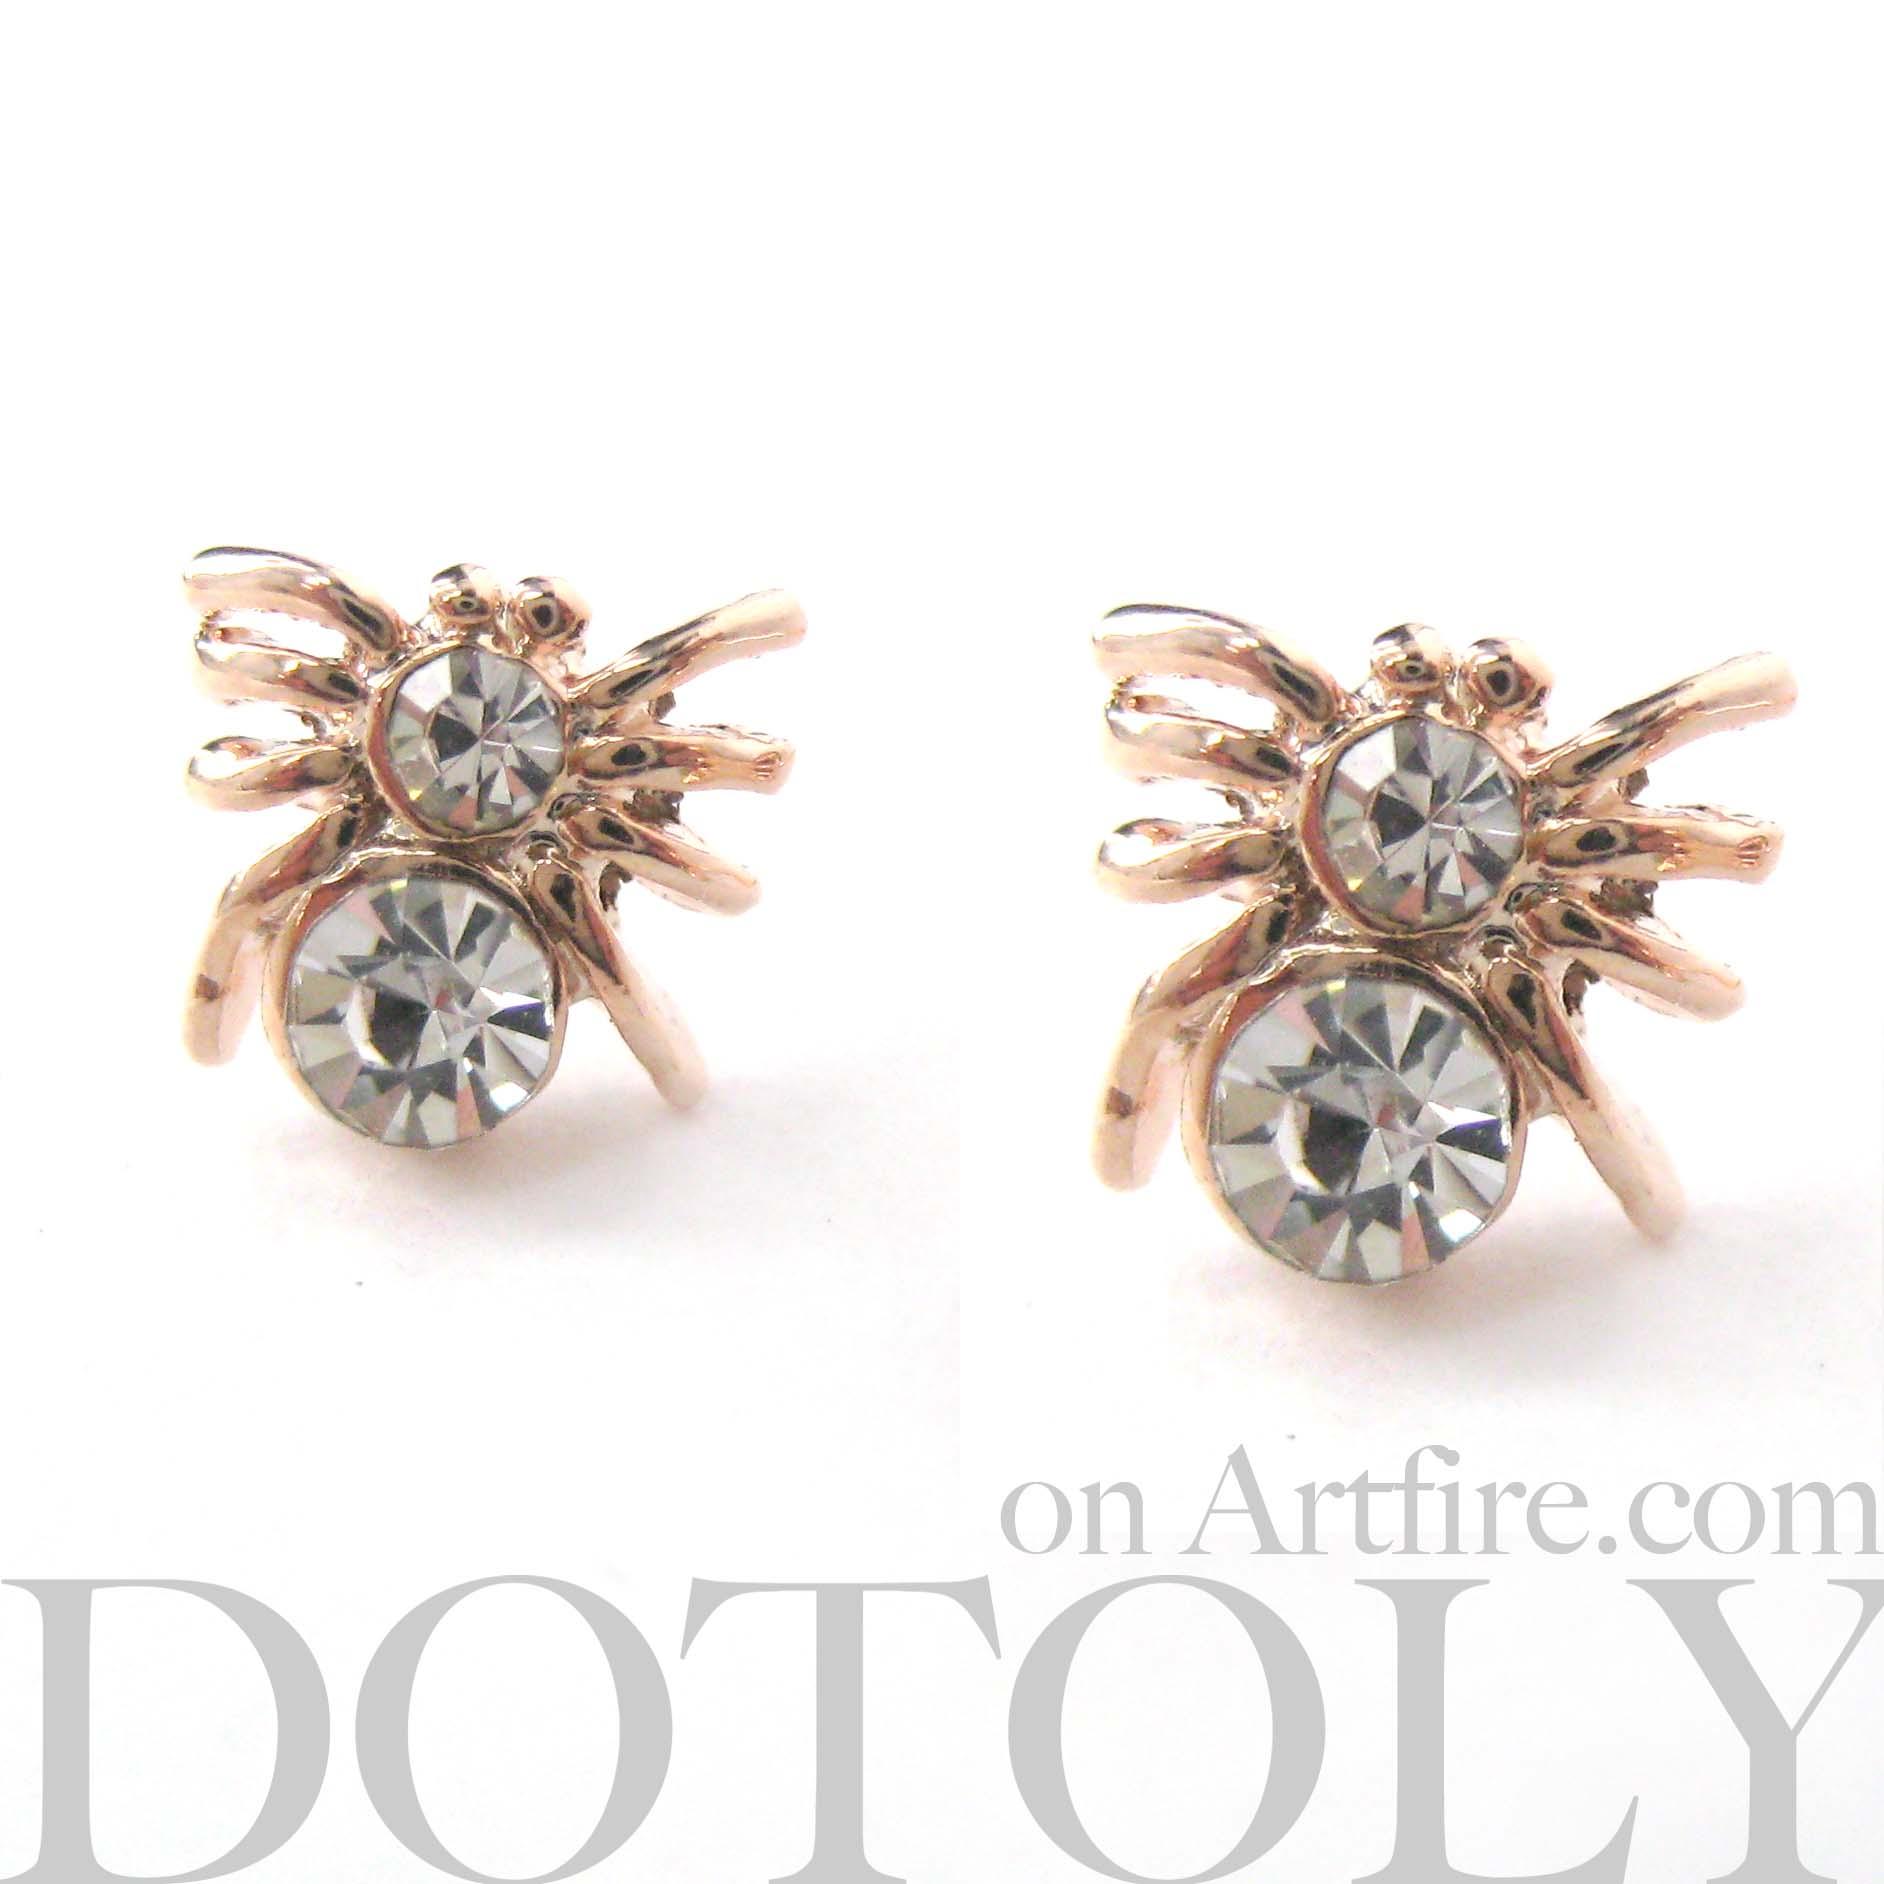 small spider tarantula insect bug animal stud earrings